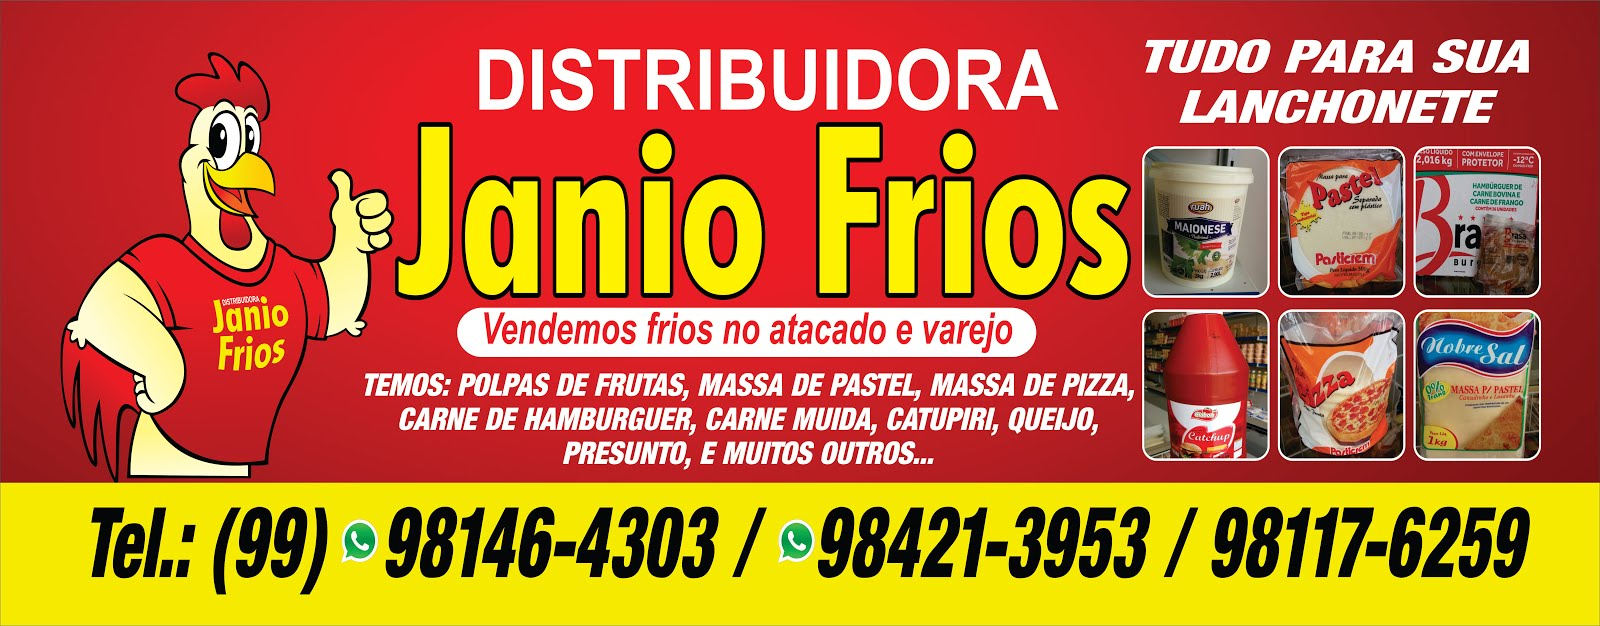 DISTRIBUIDORA JANIO FRIOS